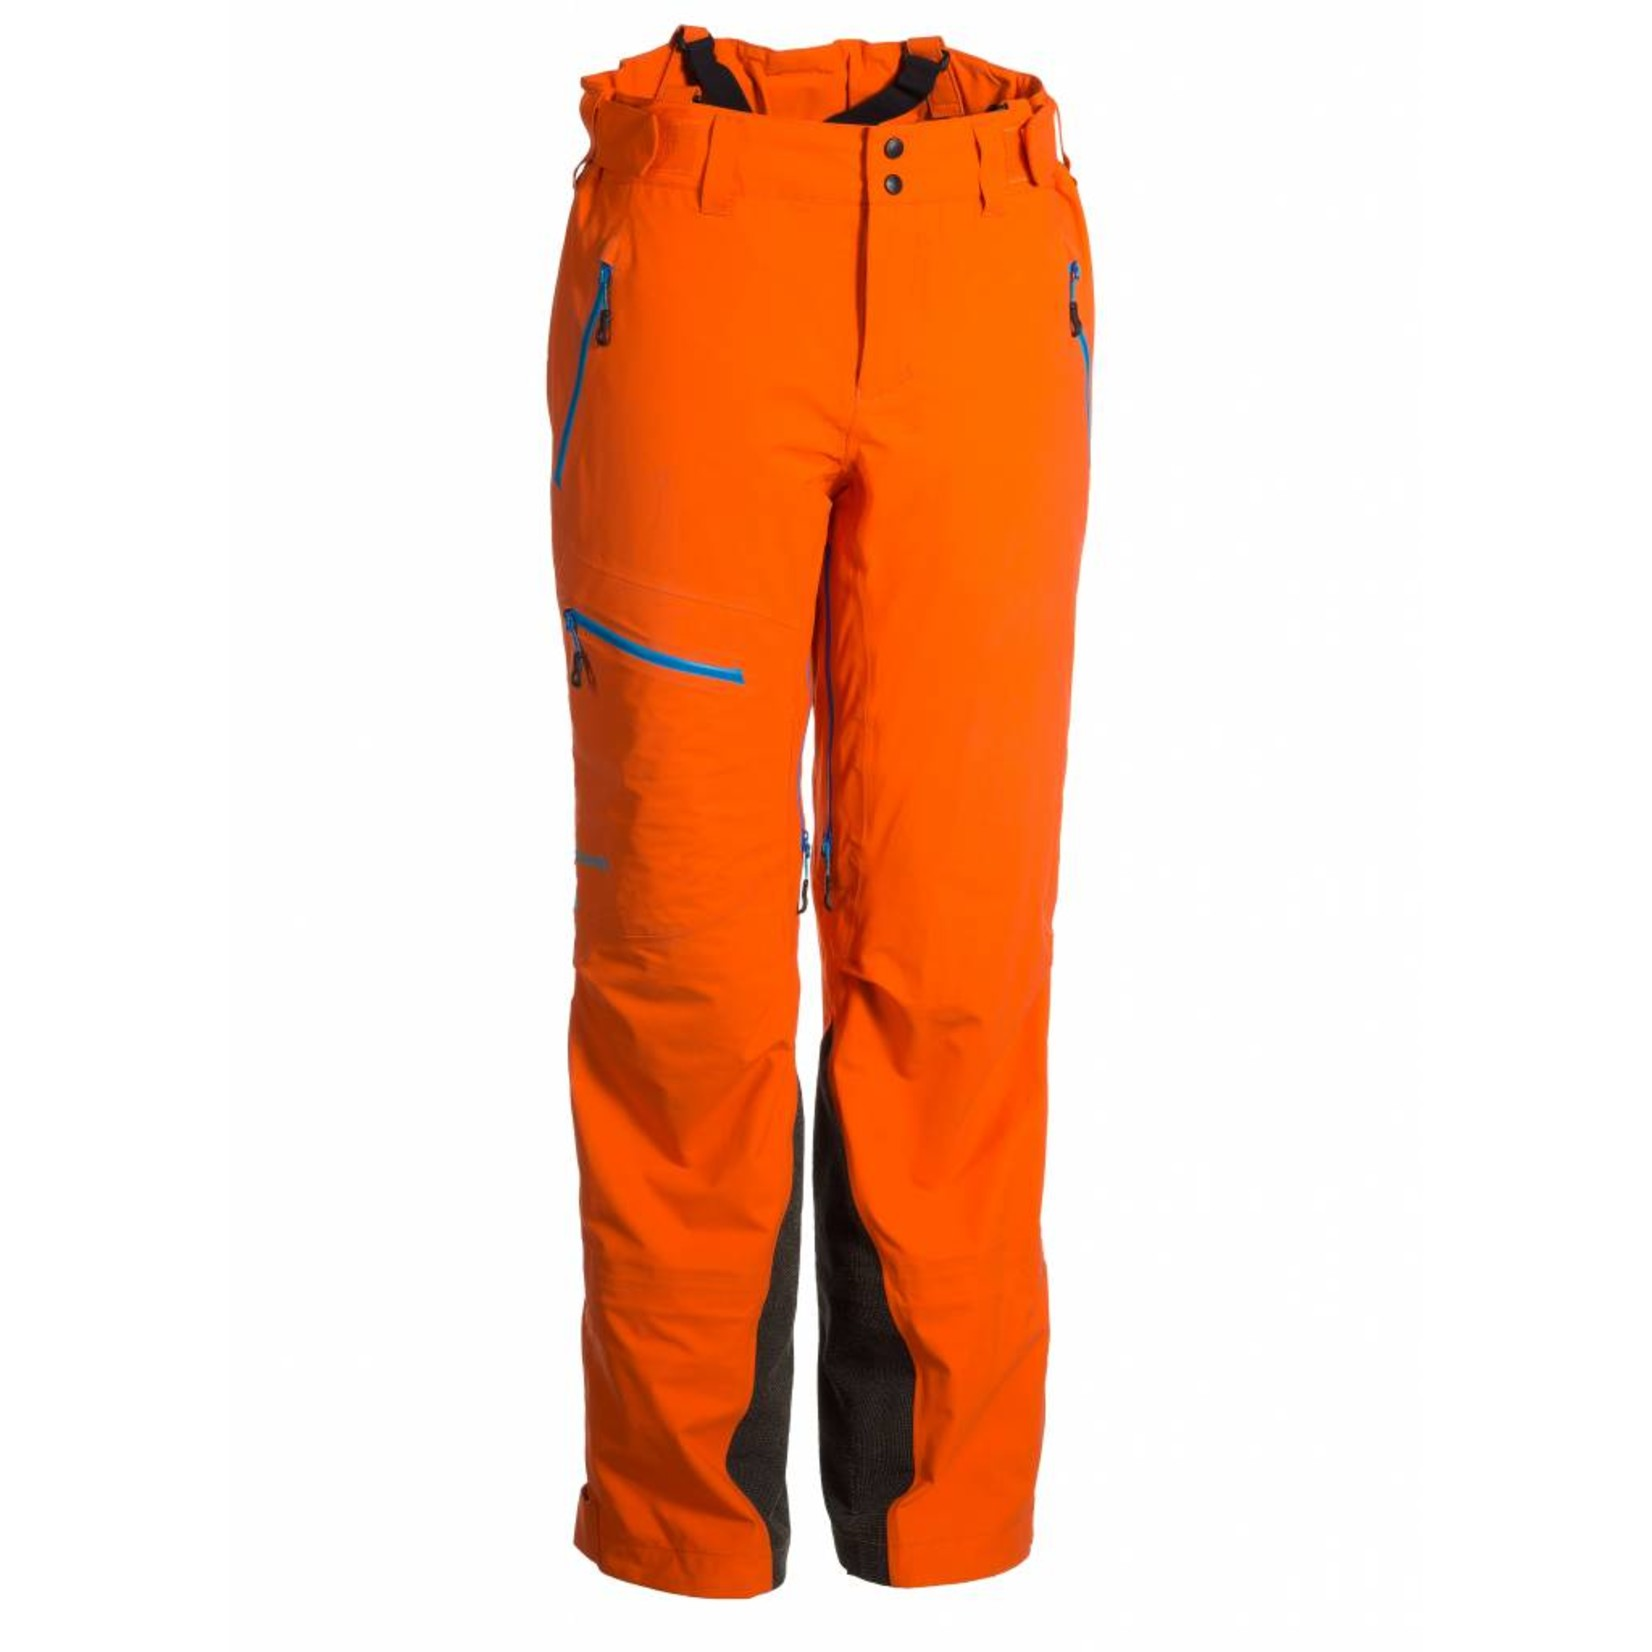 PHENIX Black Powder 3L Shell Pants - OR